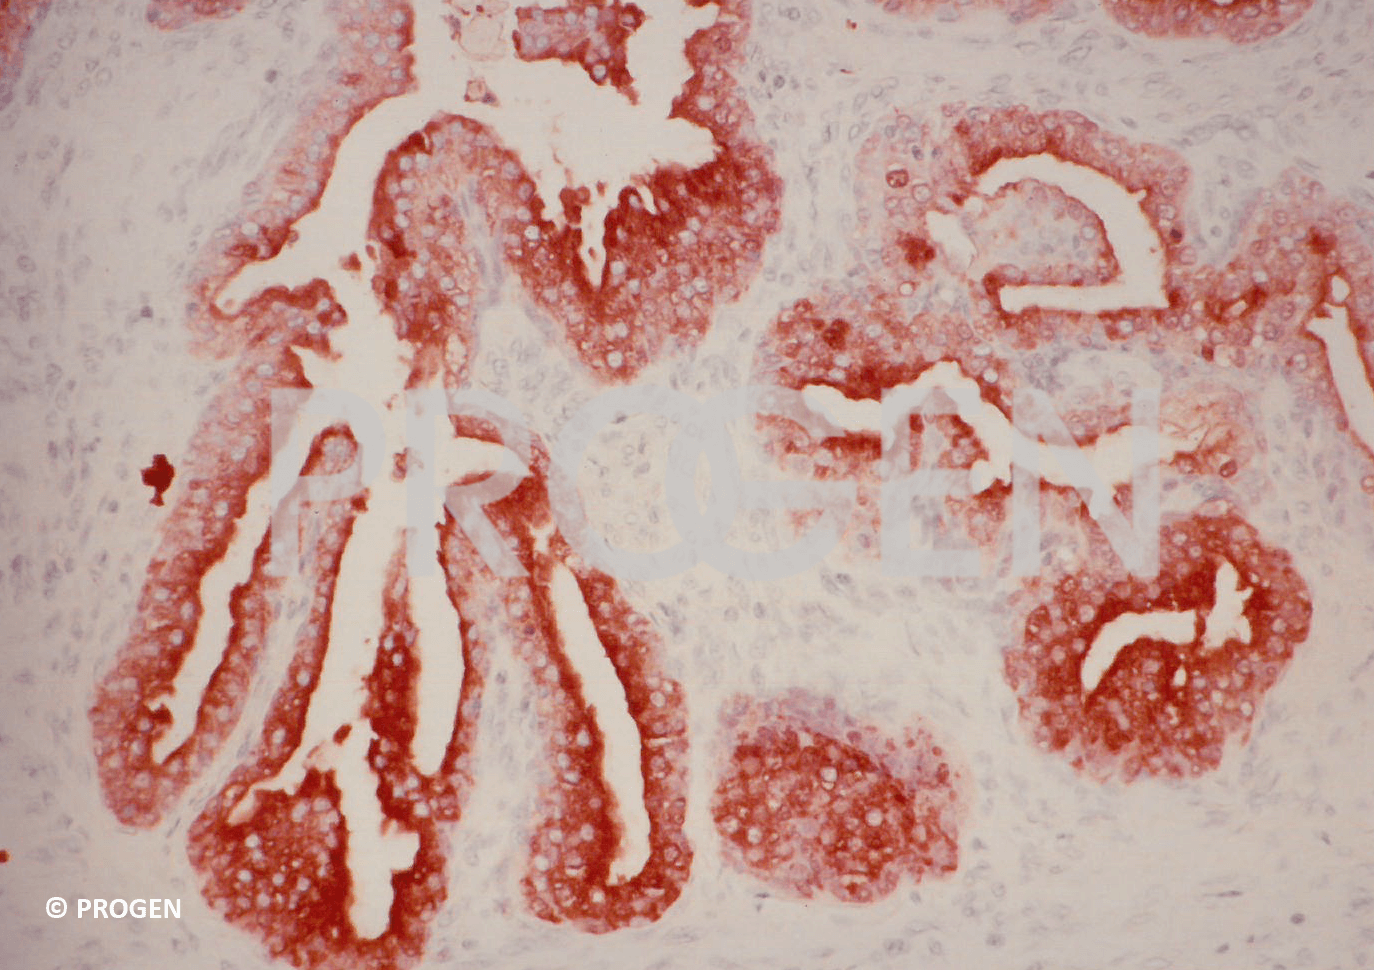 anti-Prostate-Specific Antigen mouse monoclonal, ER-PR8, ascites fluid